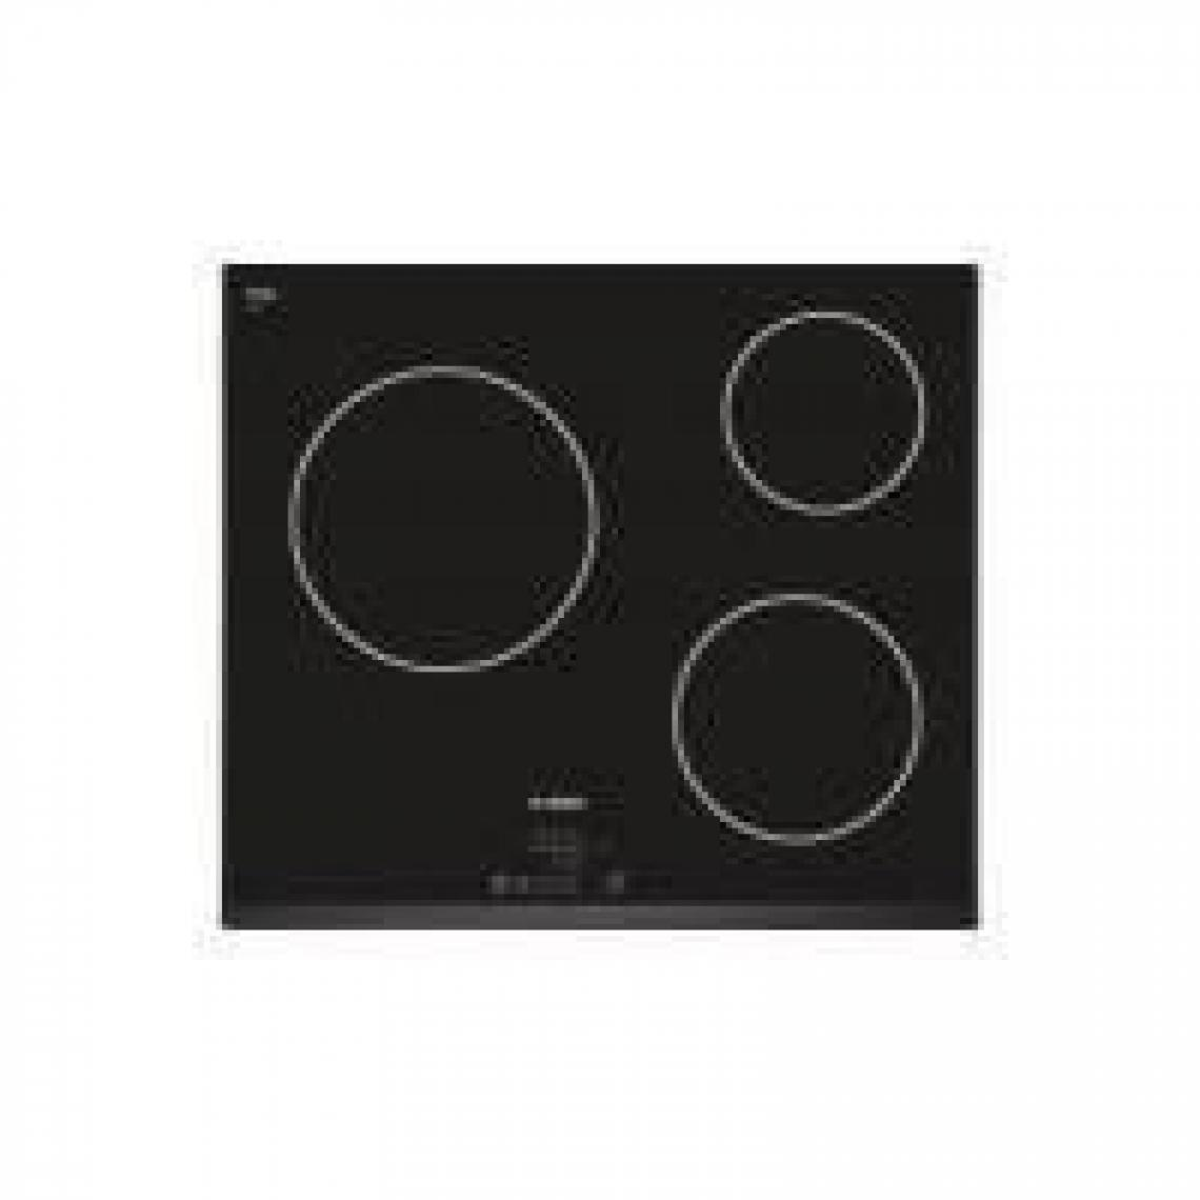 Bosch Plaque induction BOSCH 5700W 59.2cm, BOS4242002721439